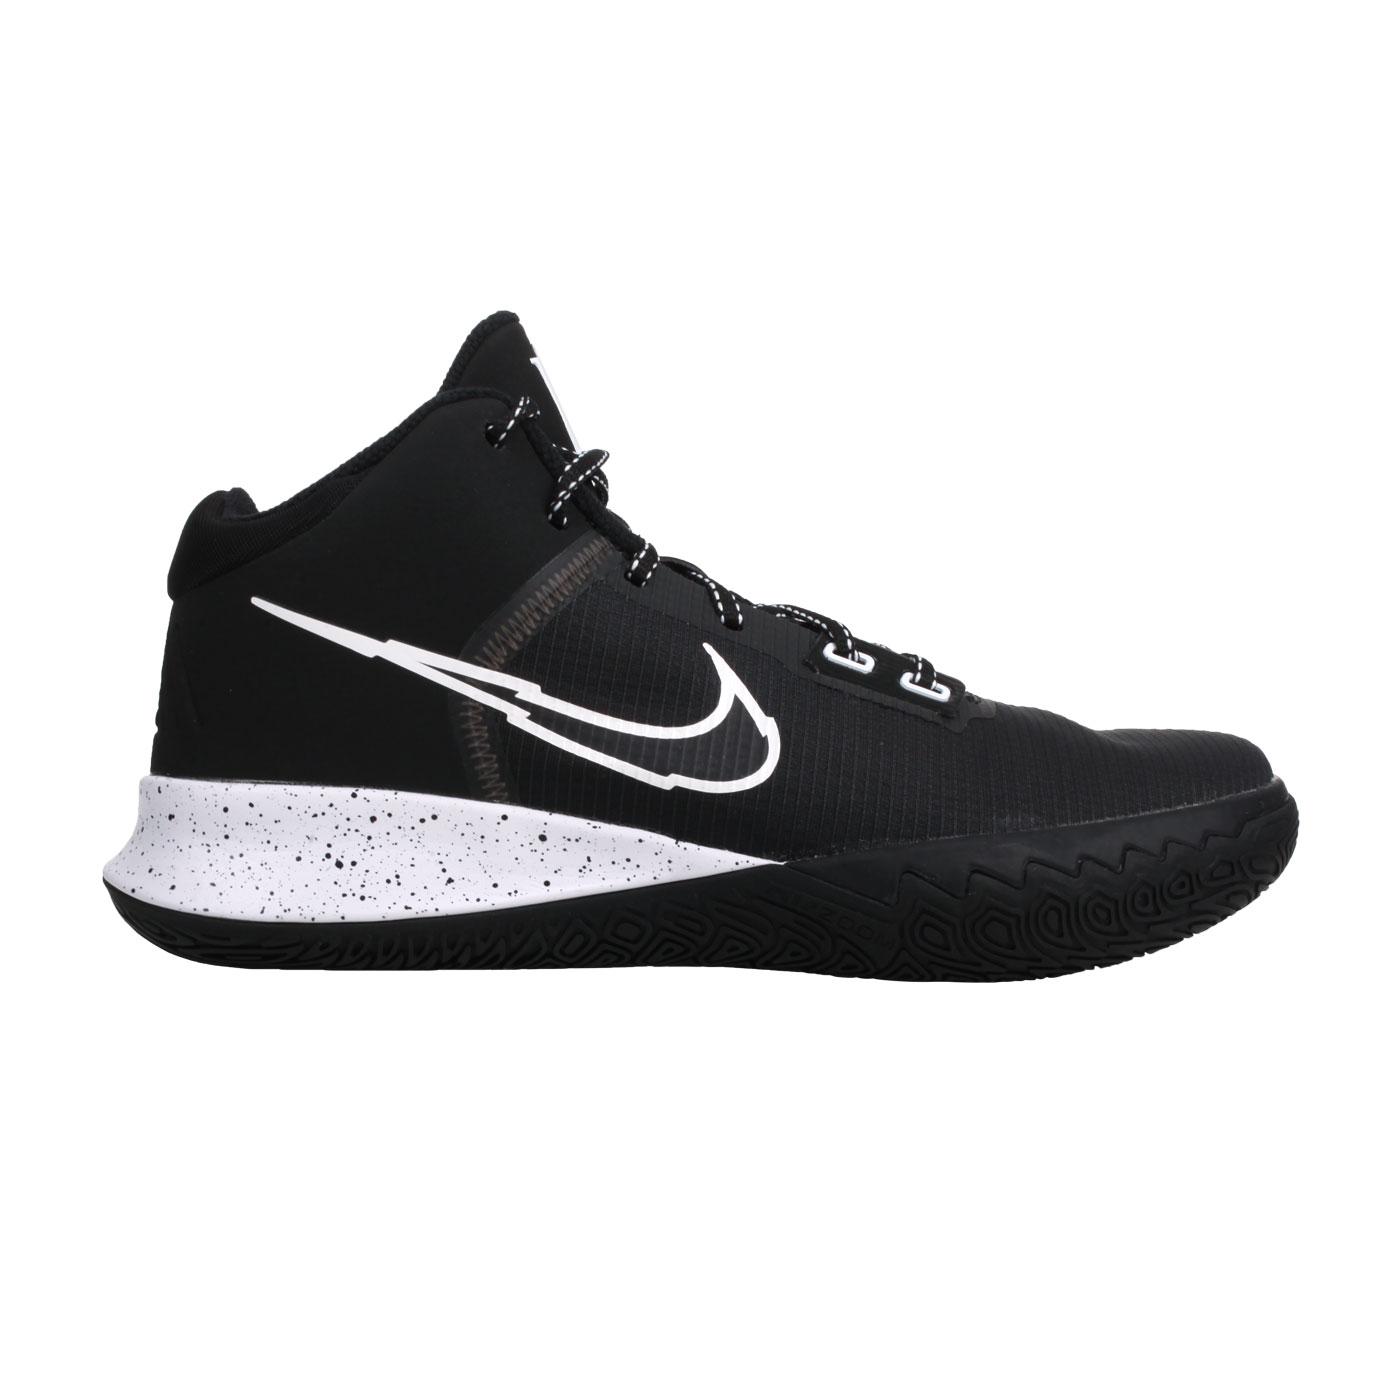 NIKE 男款籃球鞋 CT1973001 - 黑白